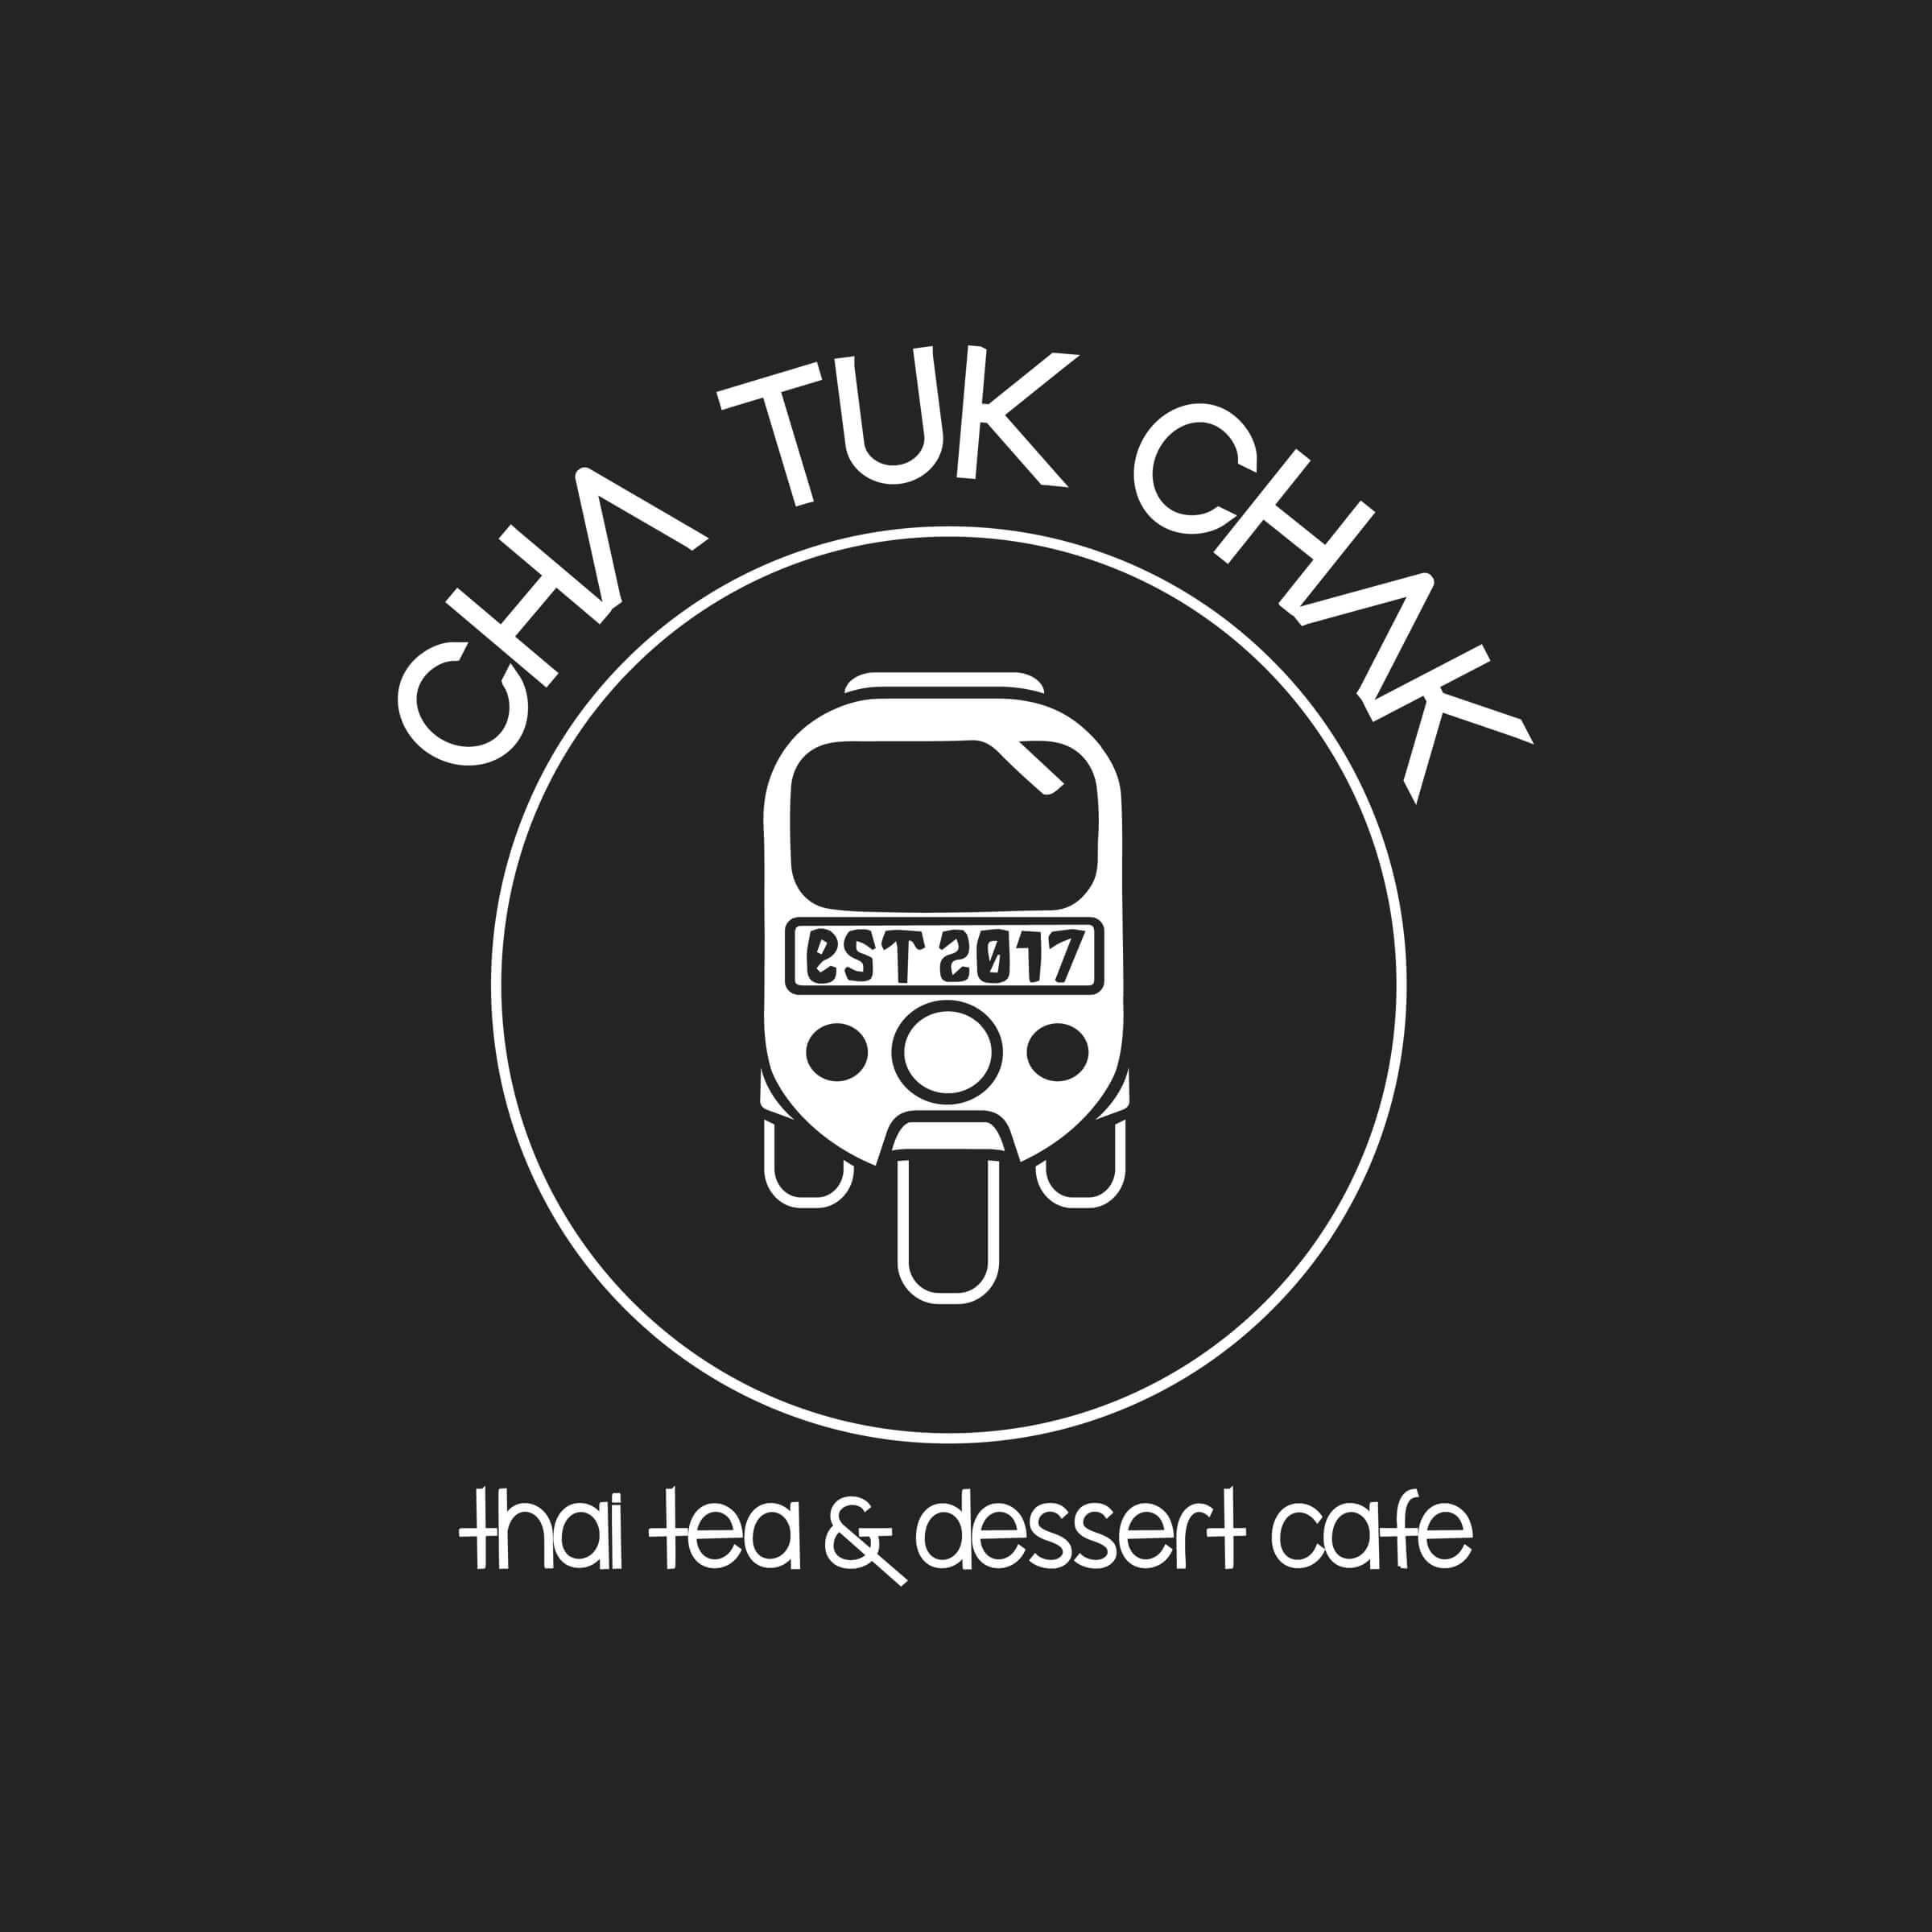 partner logo cha tuk chak